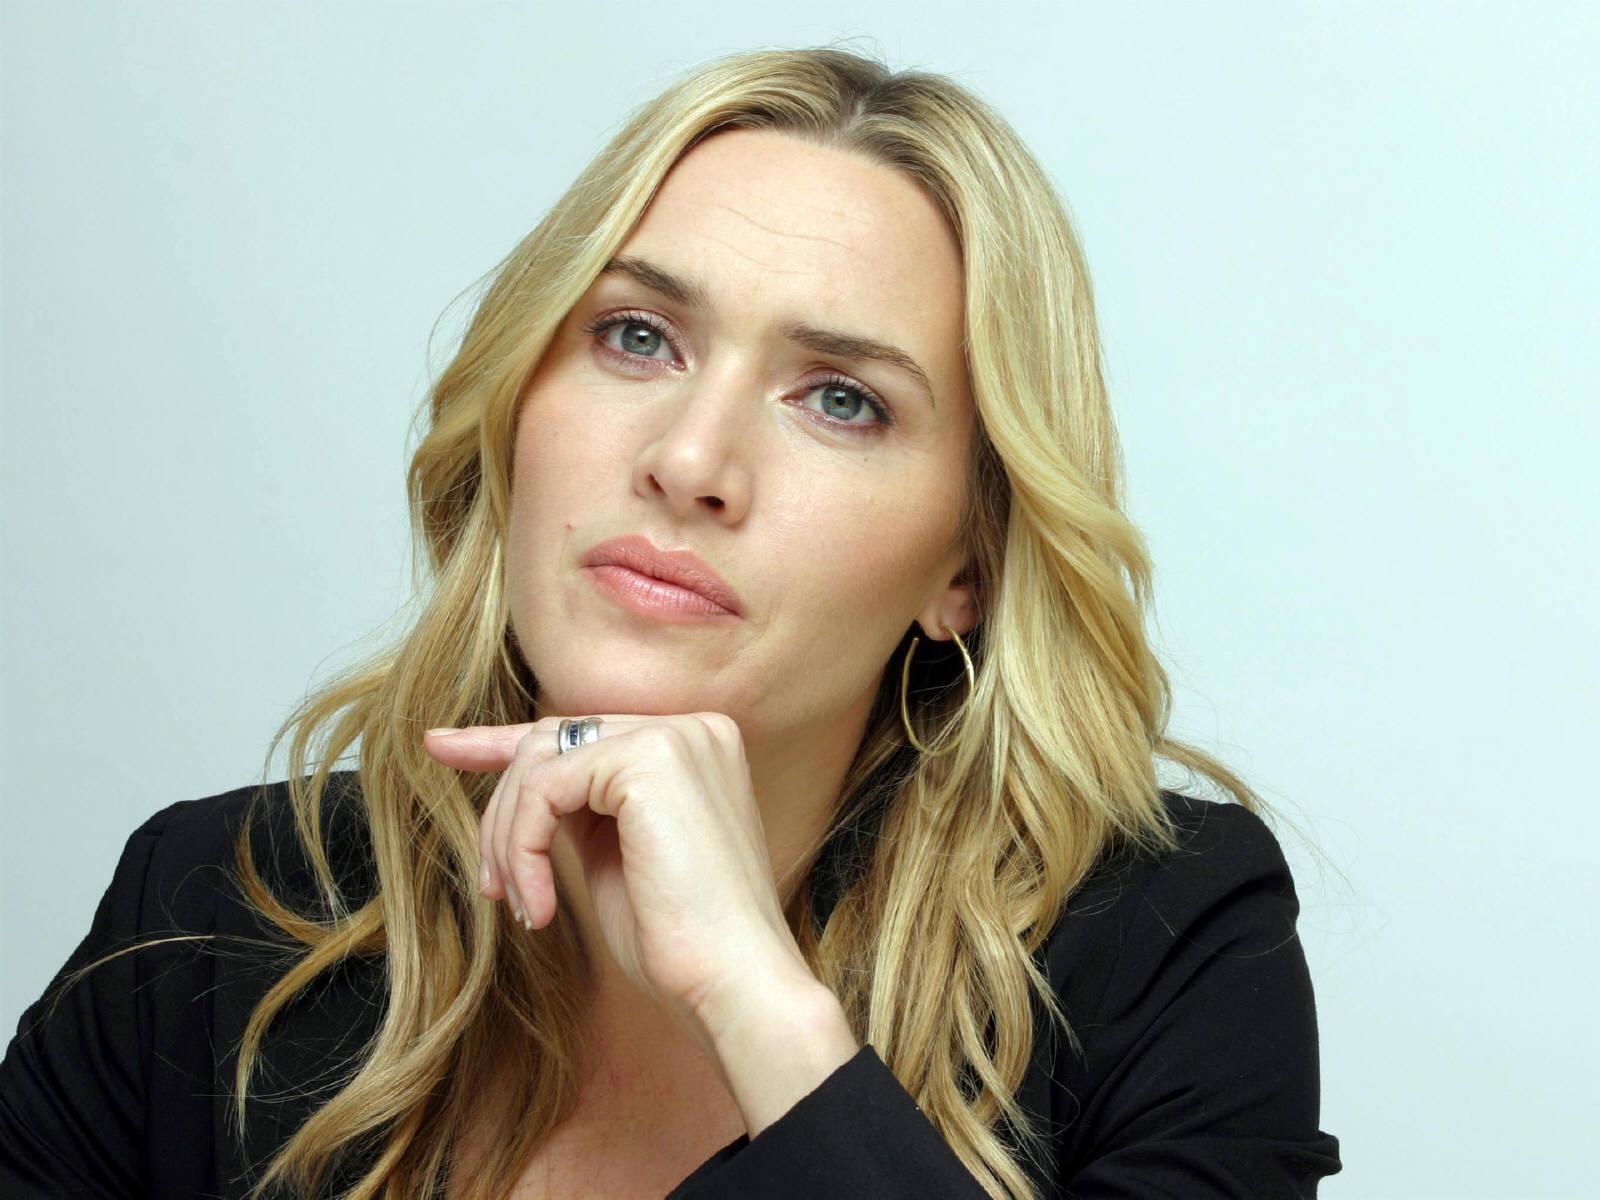 Free Download Wallpaper HD : best actress kate winslet ...